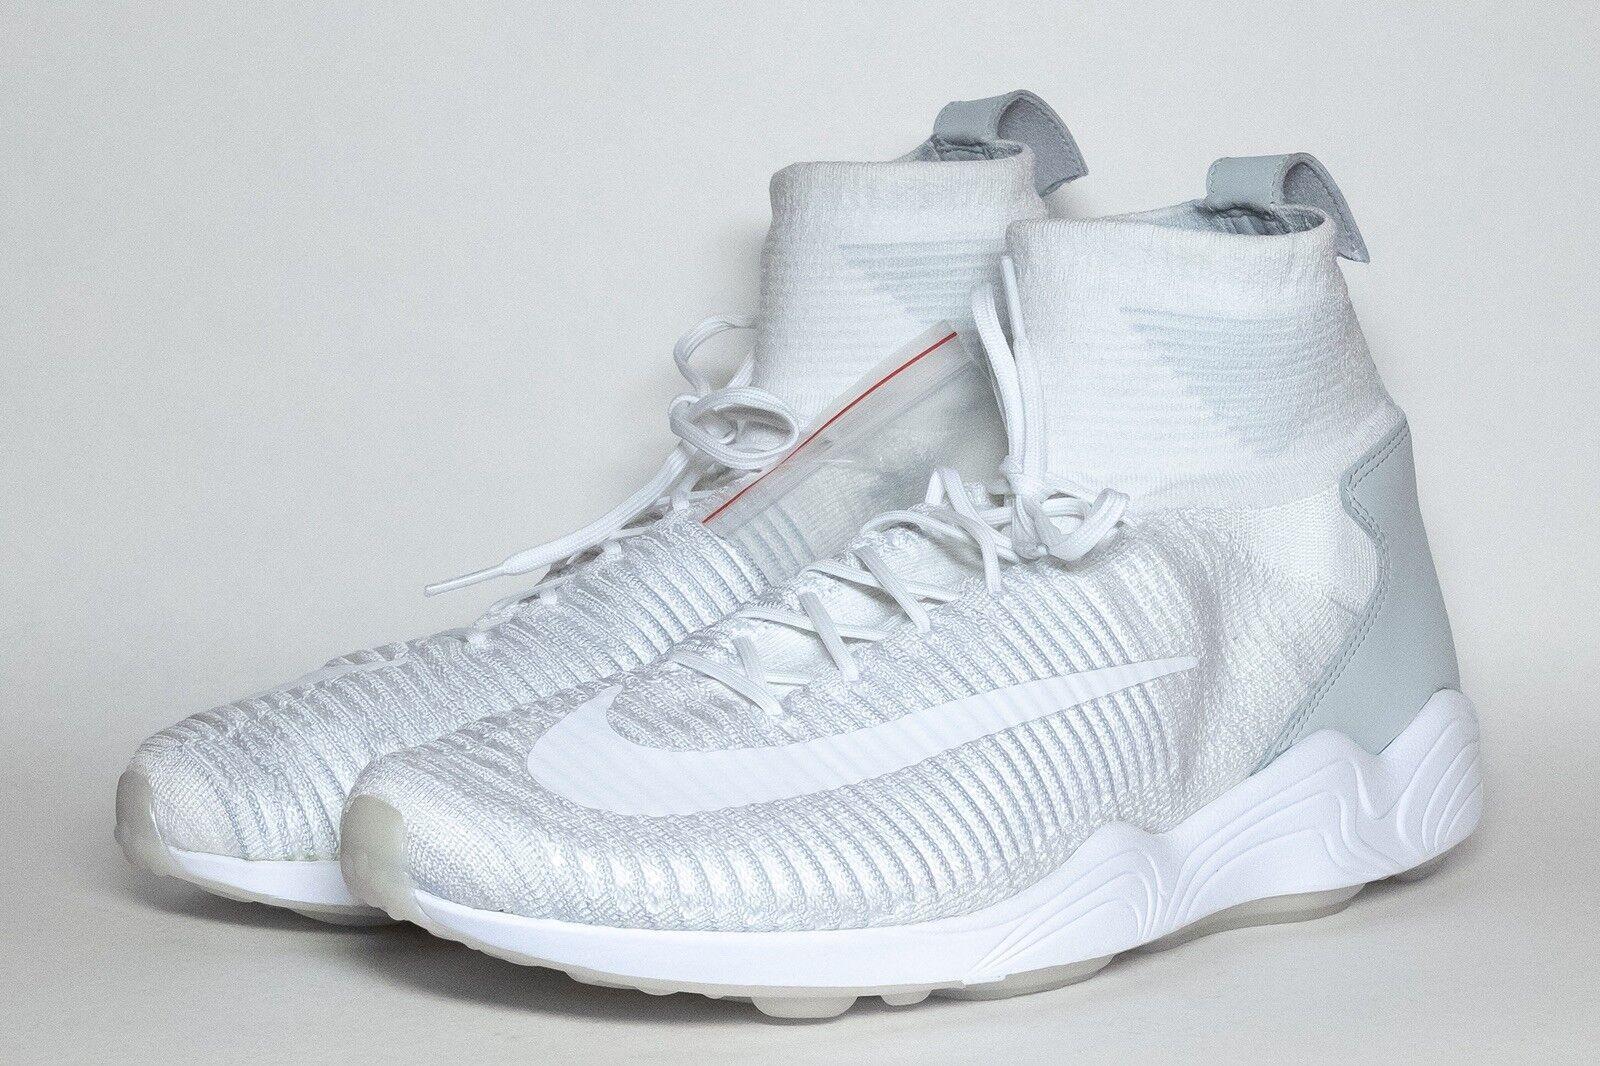 Nike Zoom mercurial XI Flyknit blanco gris Spiridon de talaria 844626-100 usa SZ 11 venta de Spiridon liquidacion de temporada b36cf5